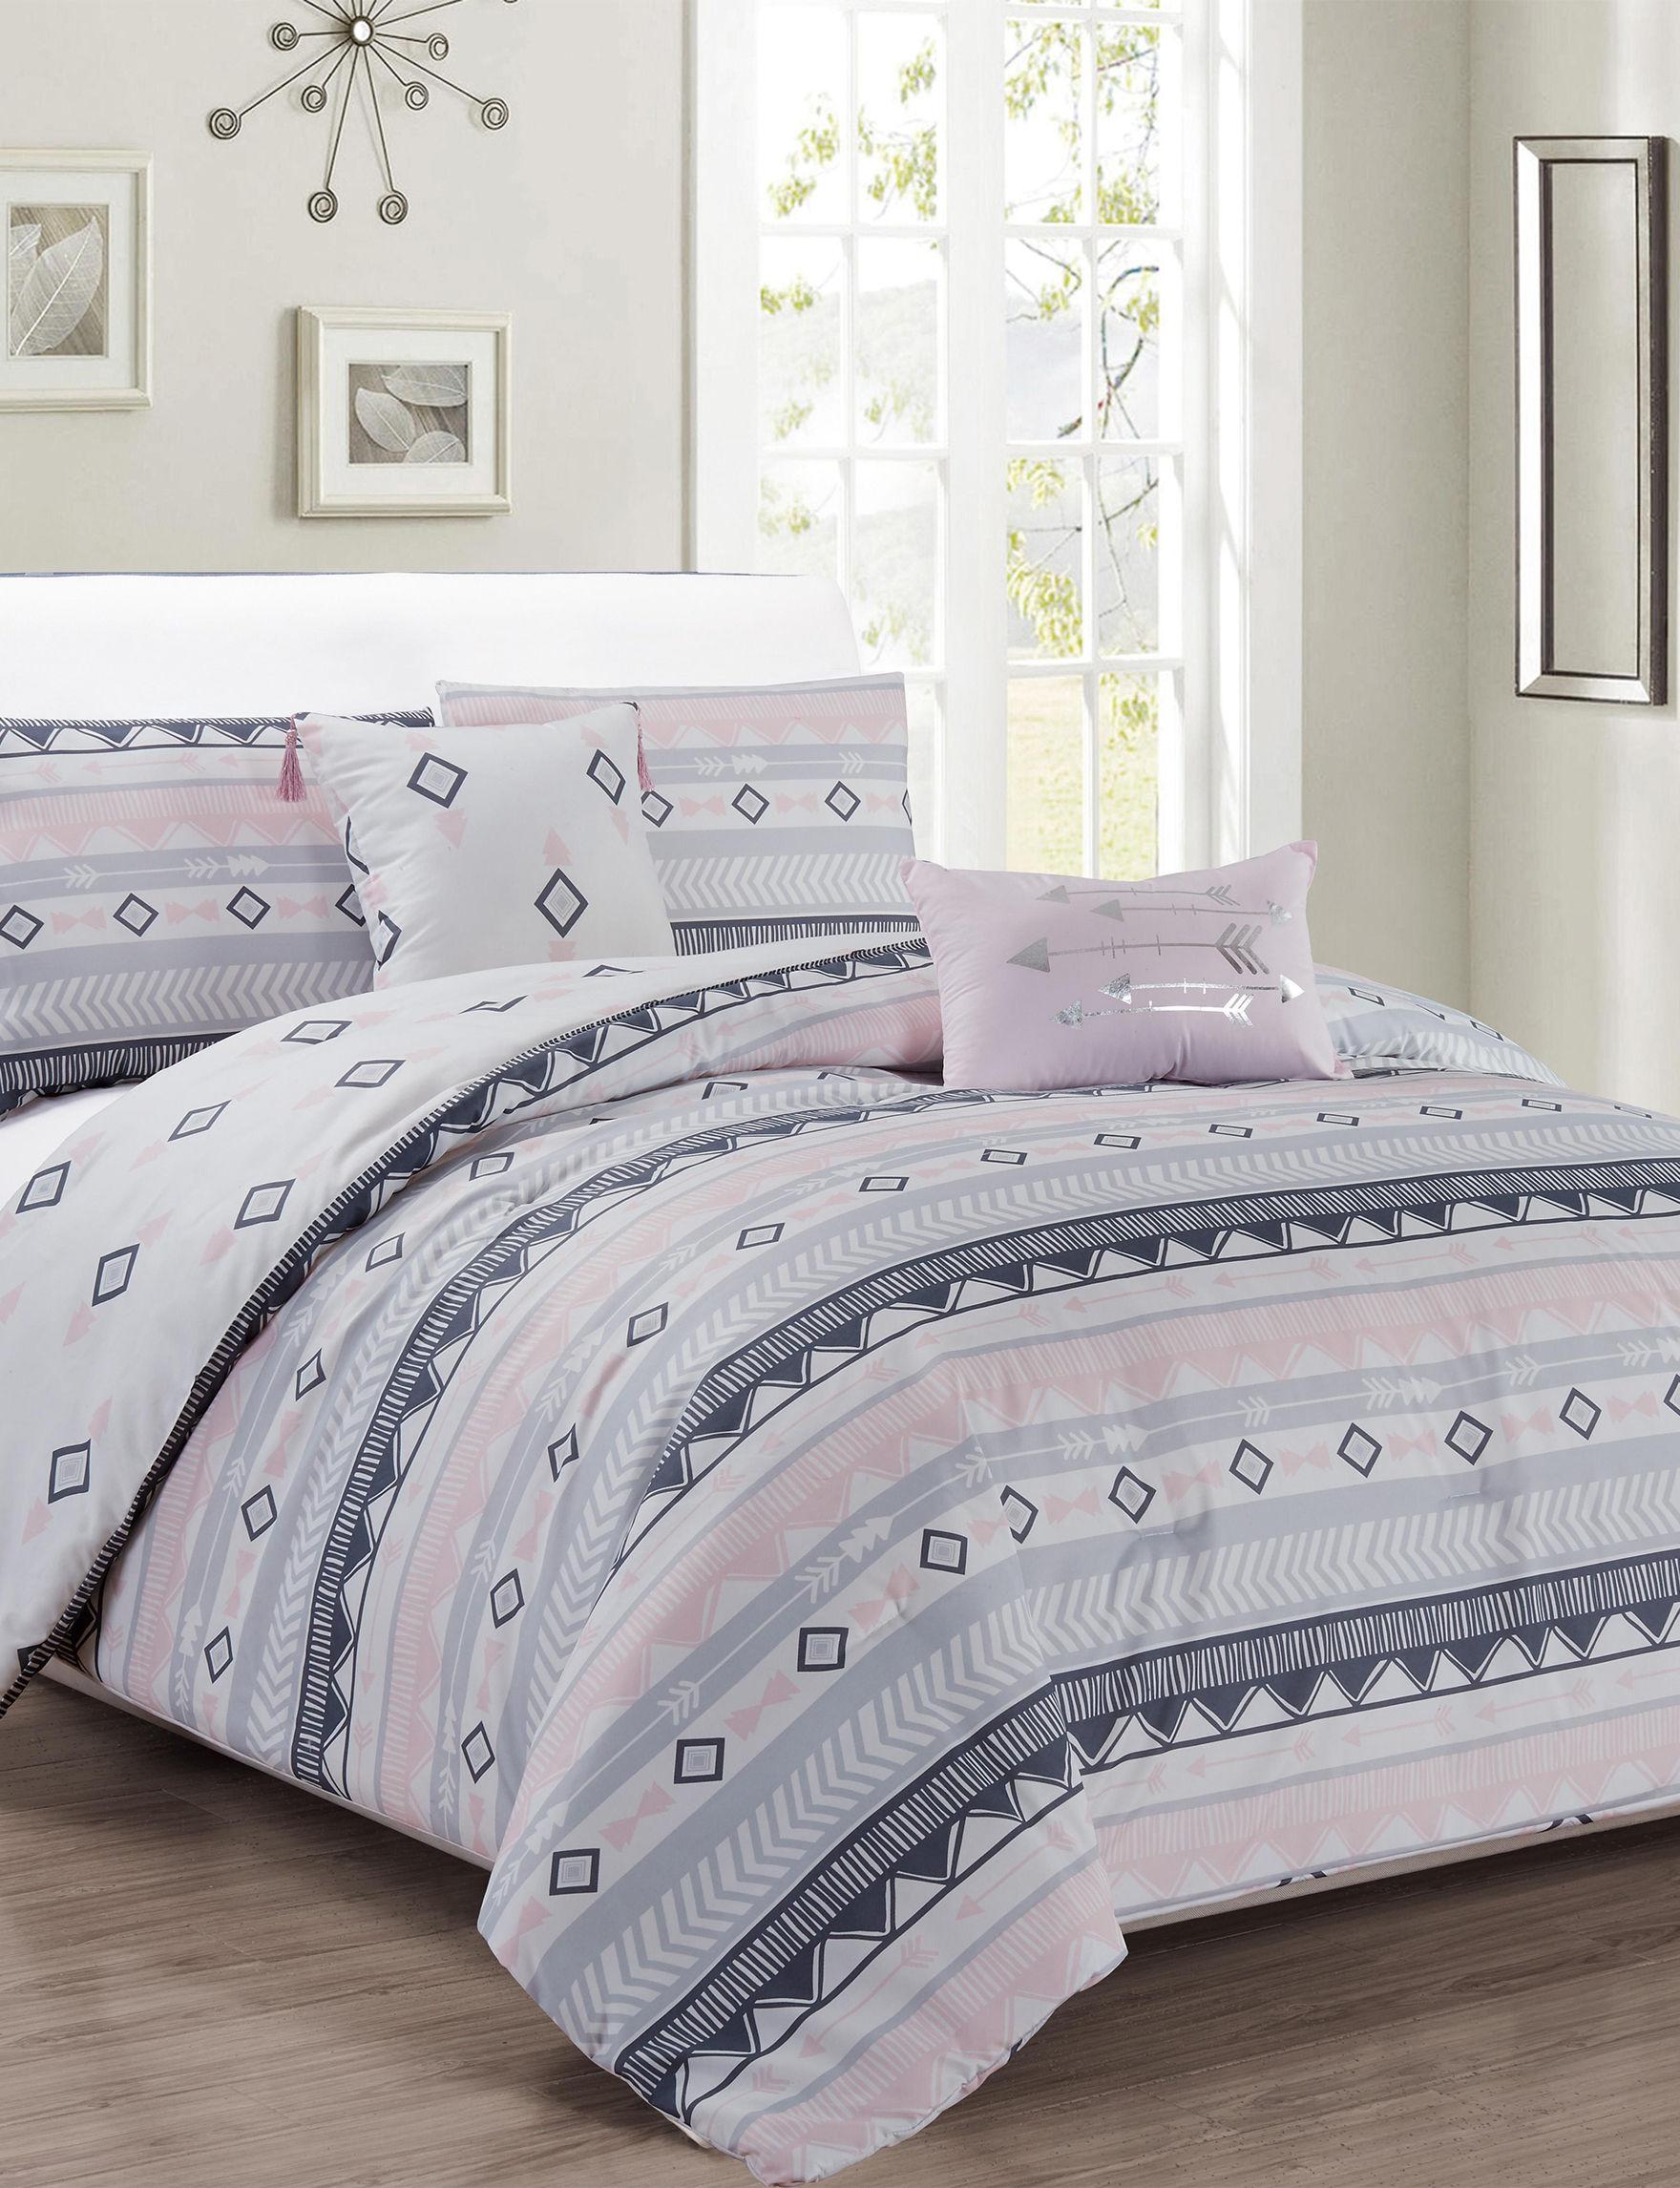 Kensie Blush Comforters & Comforter Sets